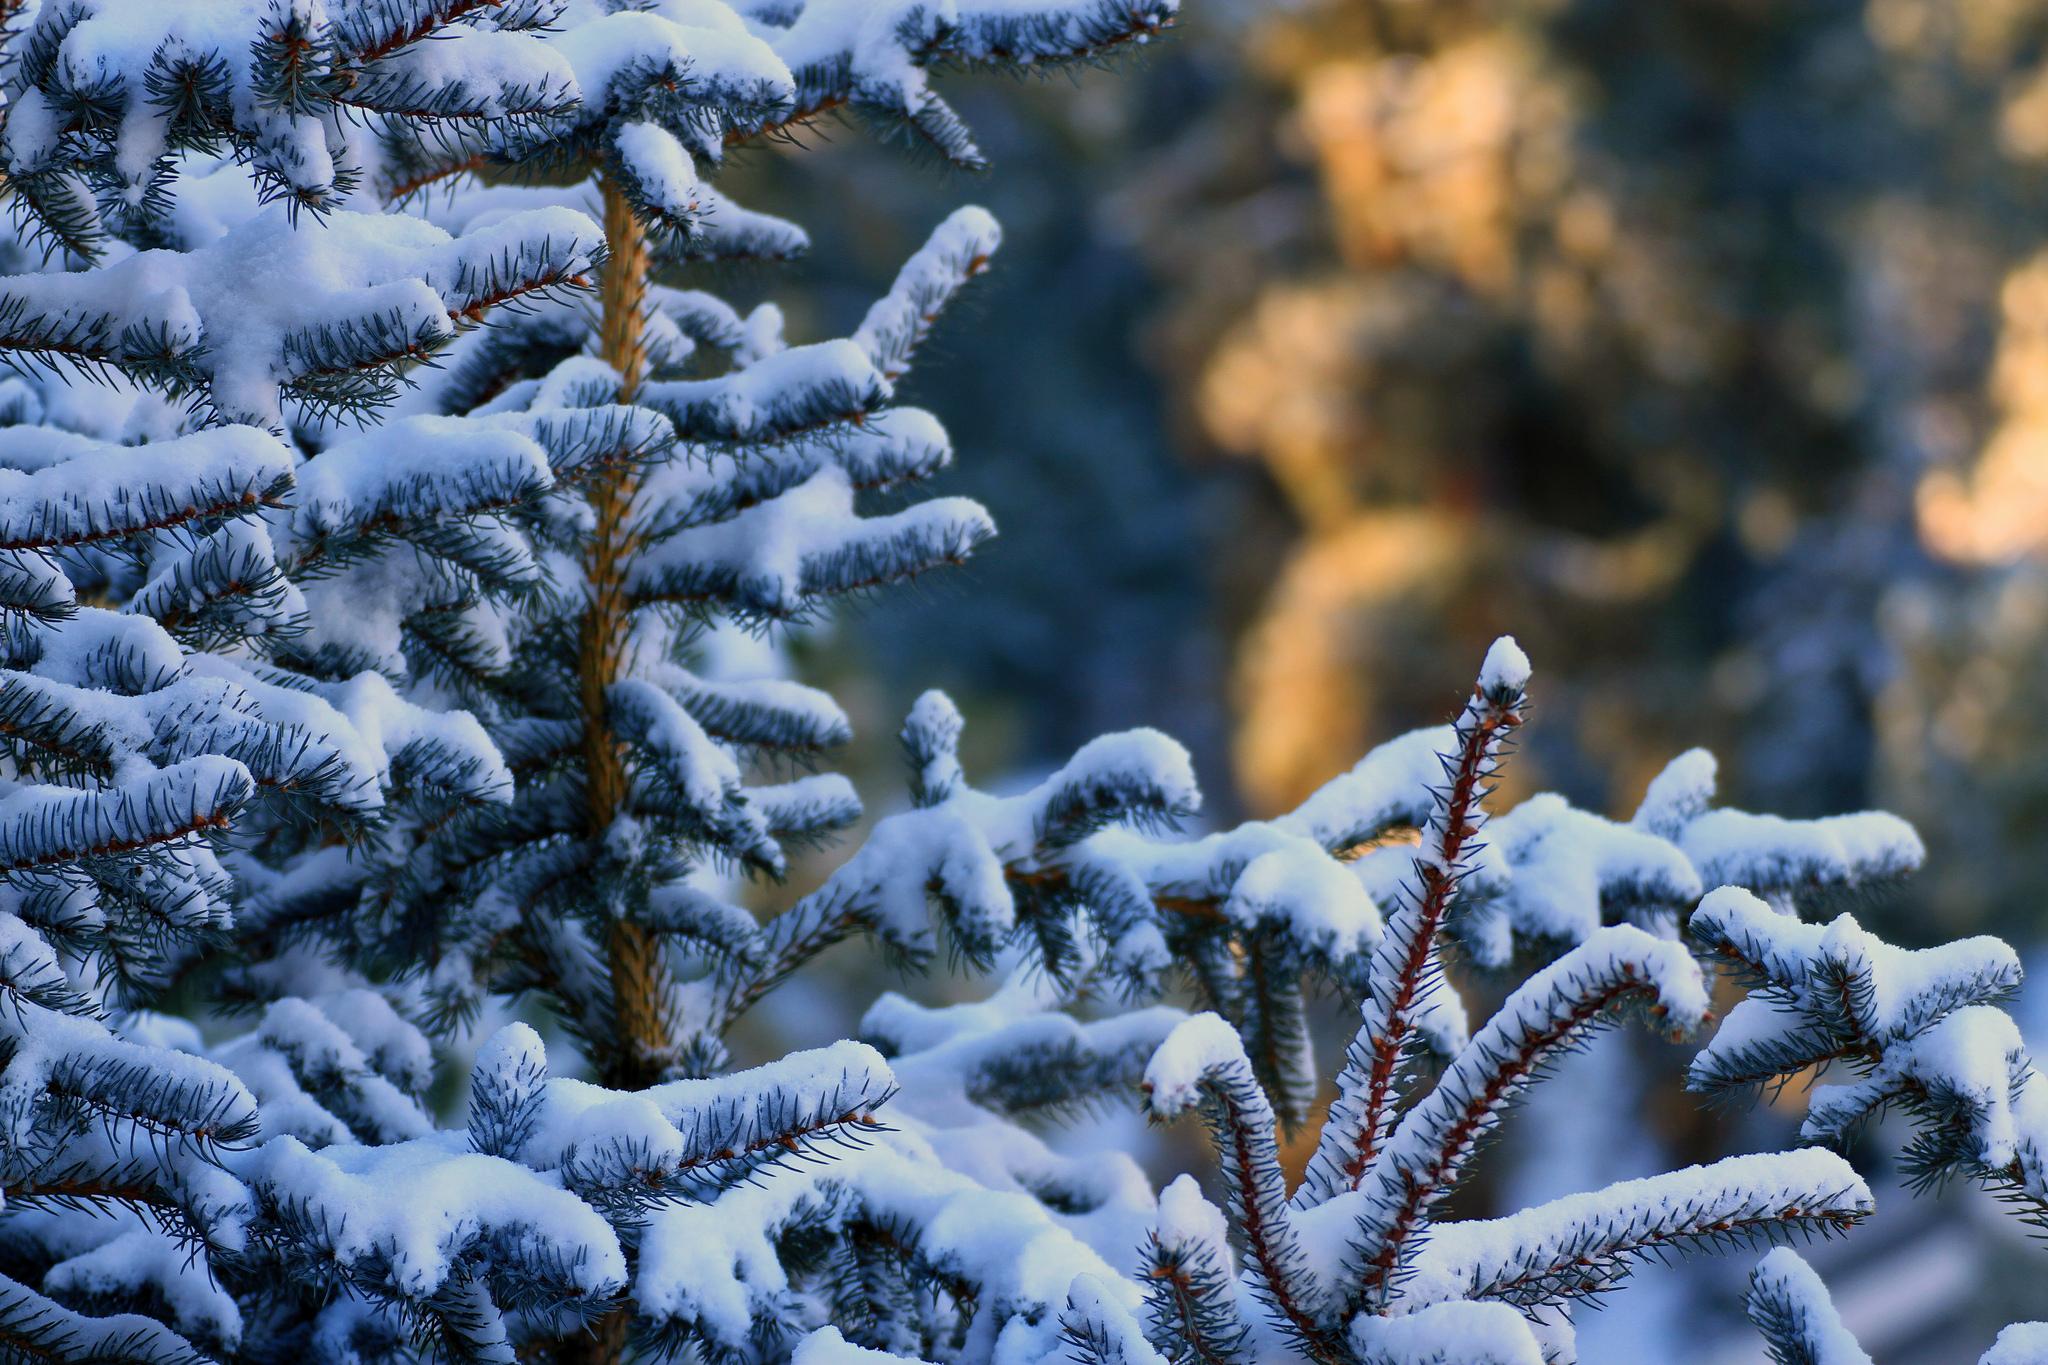 снег ветви лес snow branches forest  № 442849 бесплатно